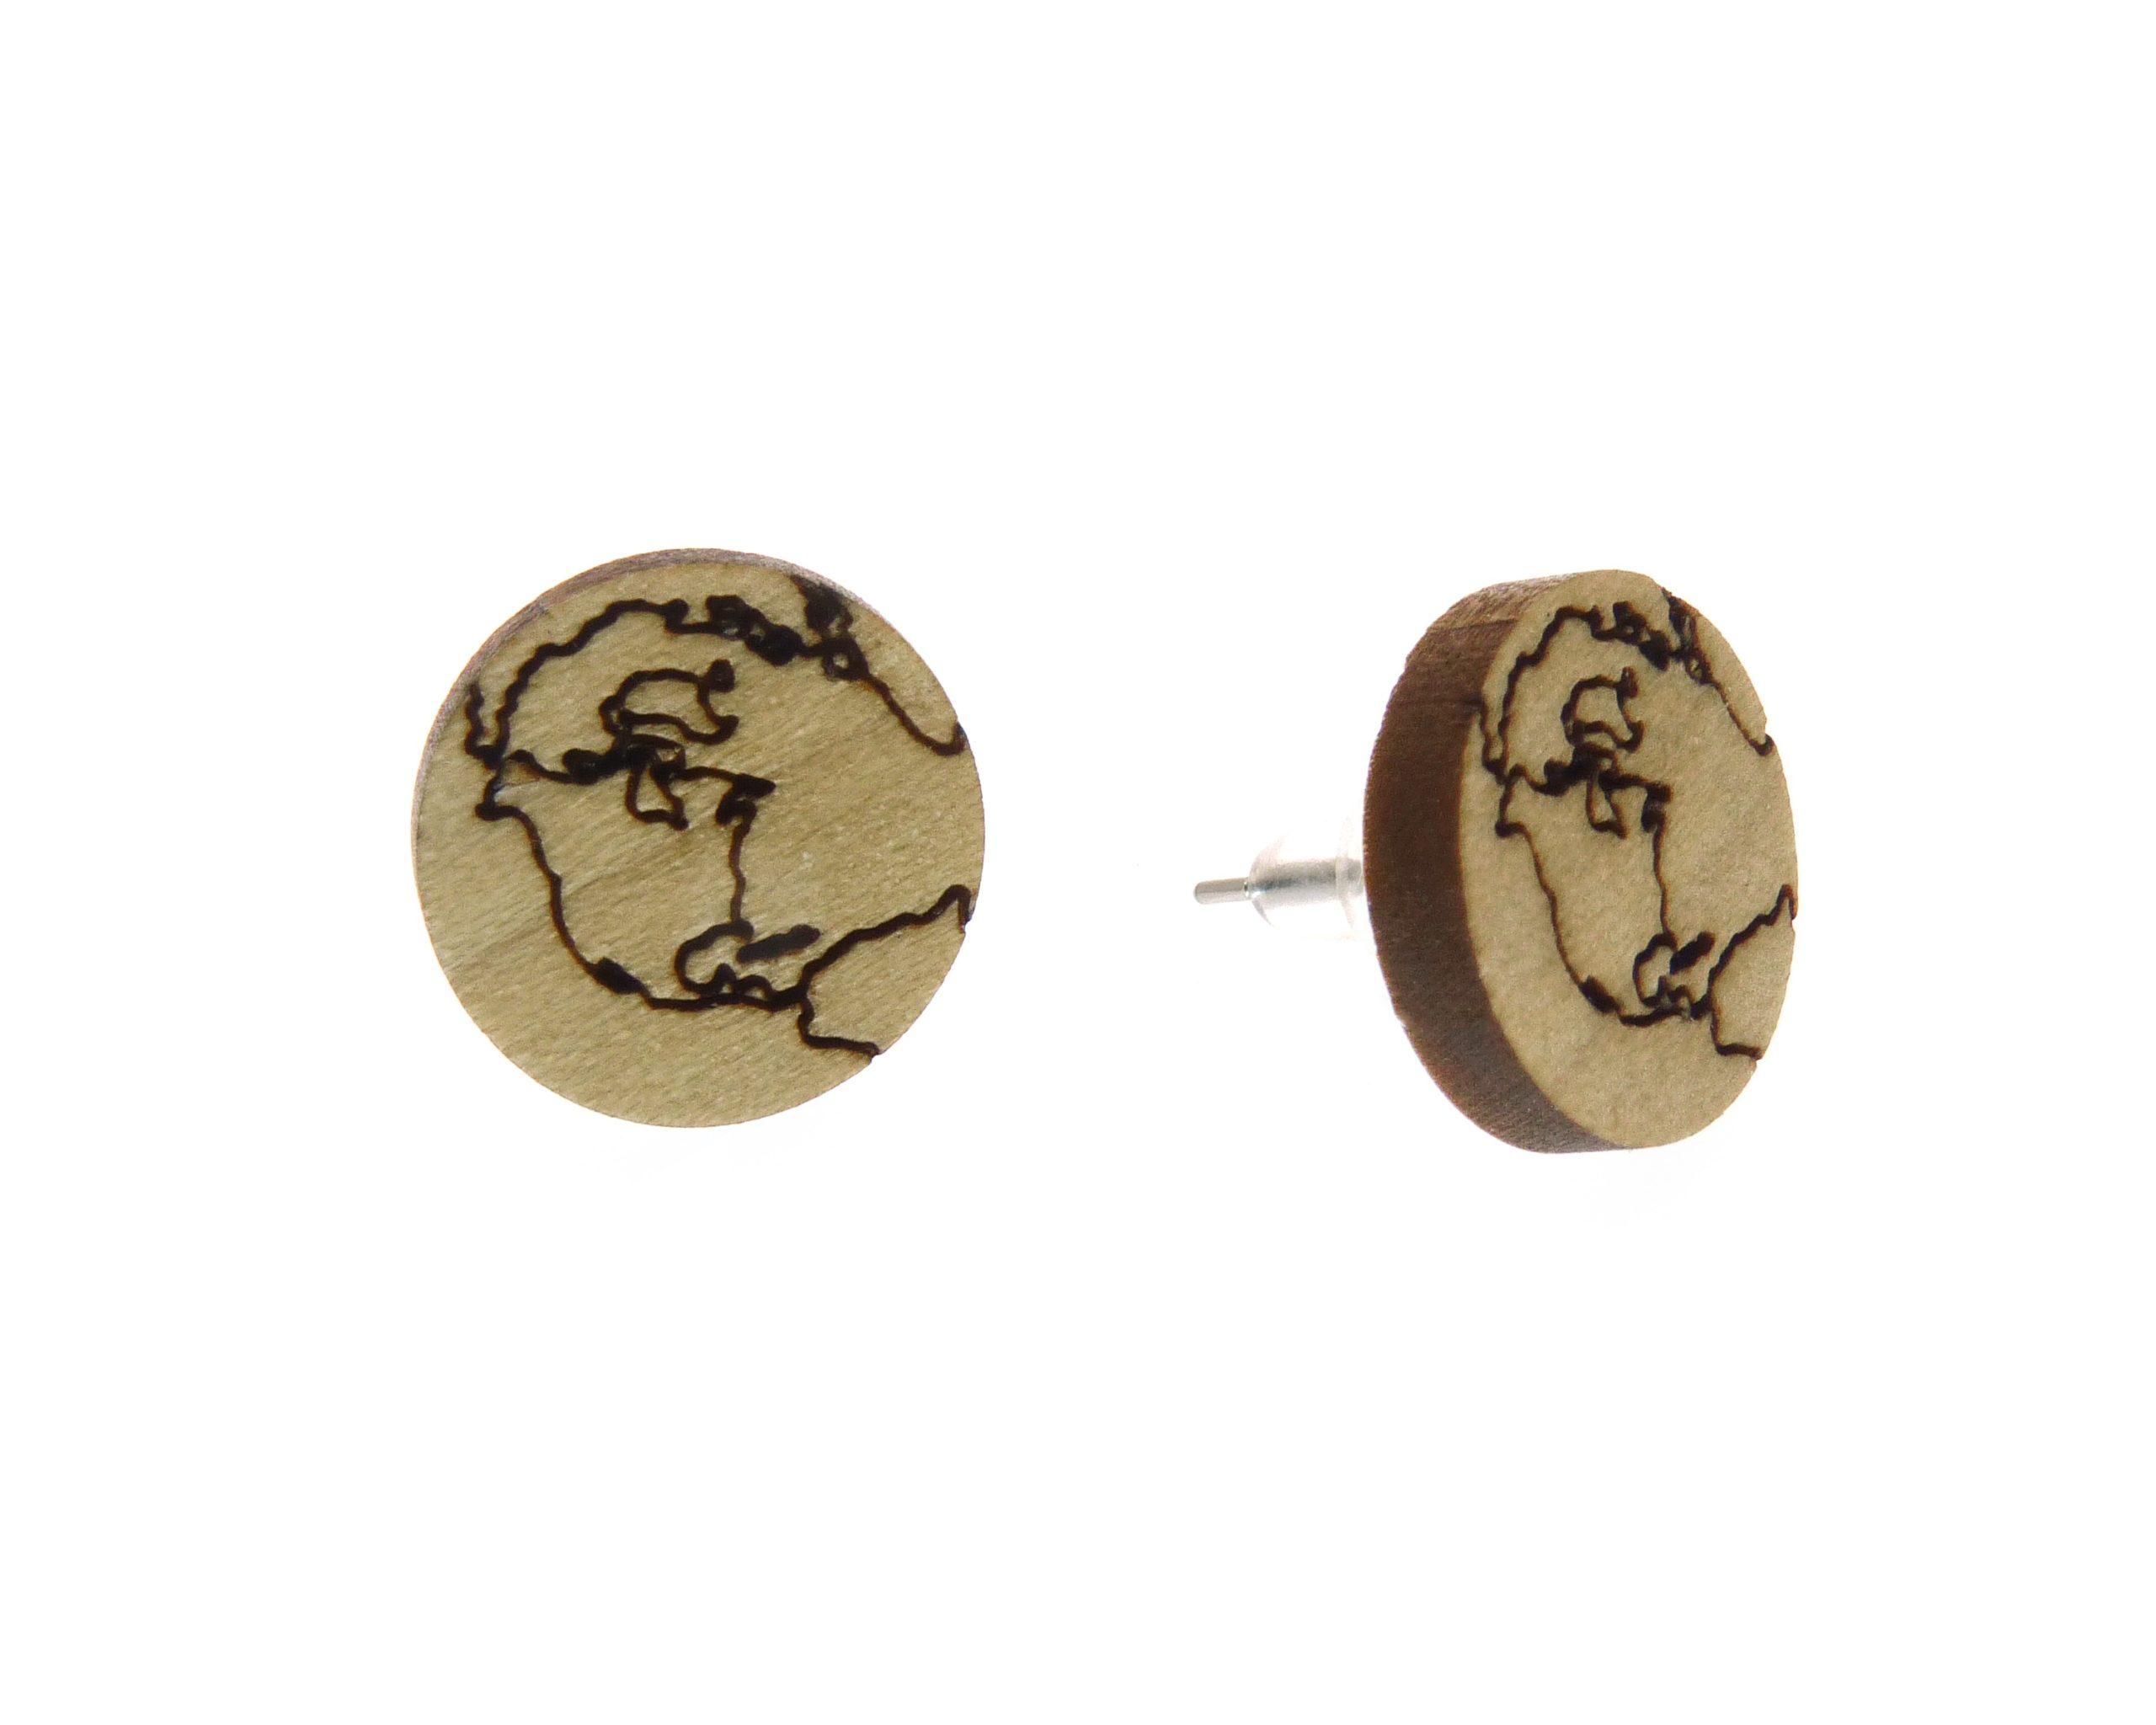 Earth Larger Poplar Hardwood Stud Earrings